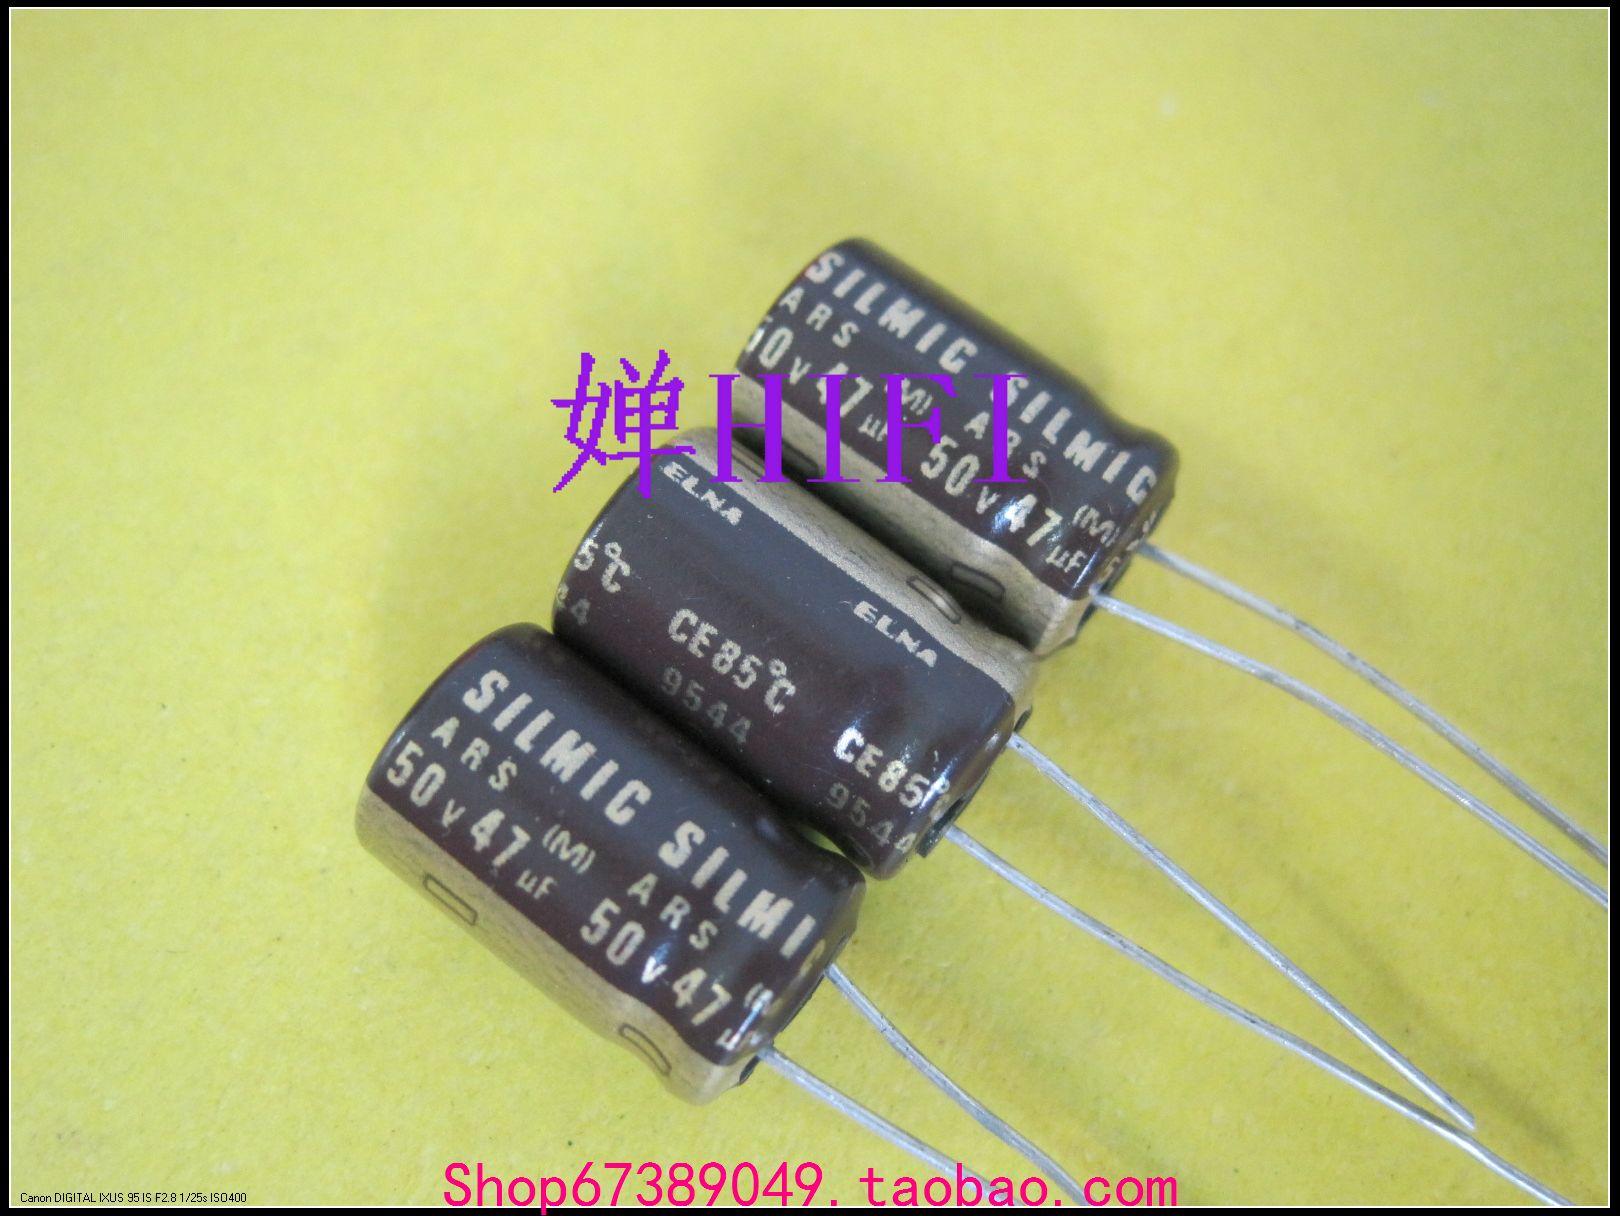 50pcs Imported ELNA original SILMIC-ARS electrolytic capacitors 50v47uf 10x16mm free shipping